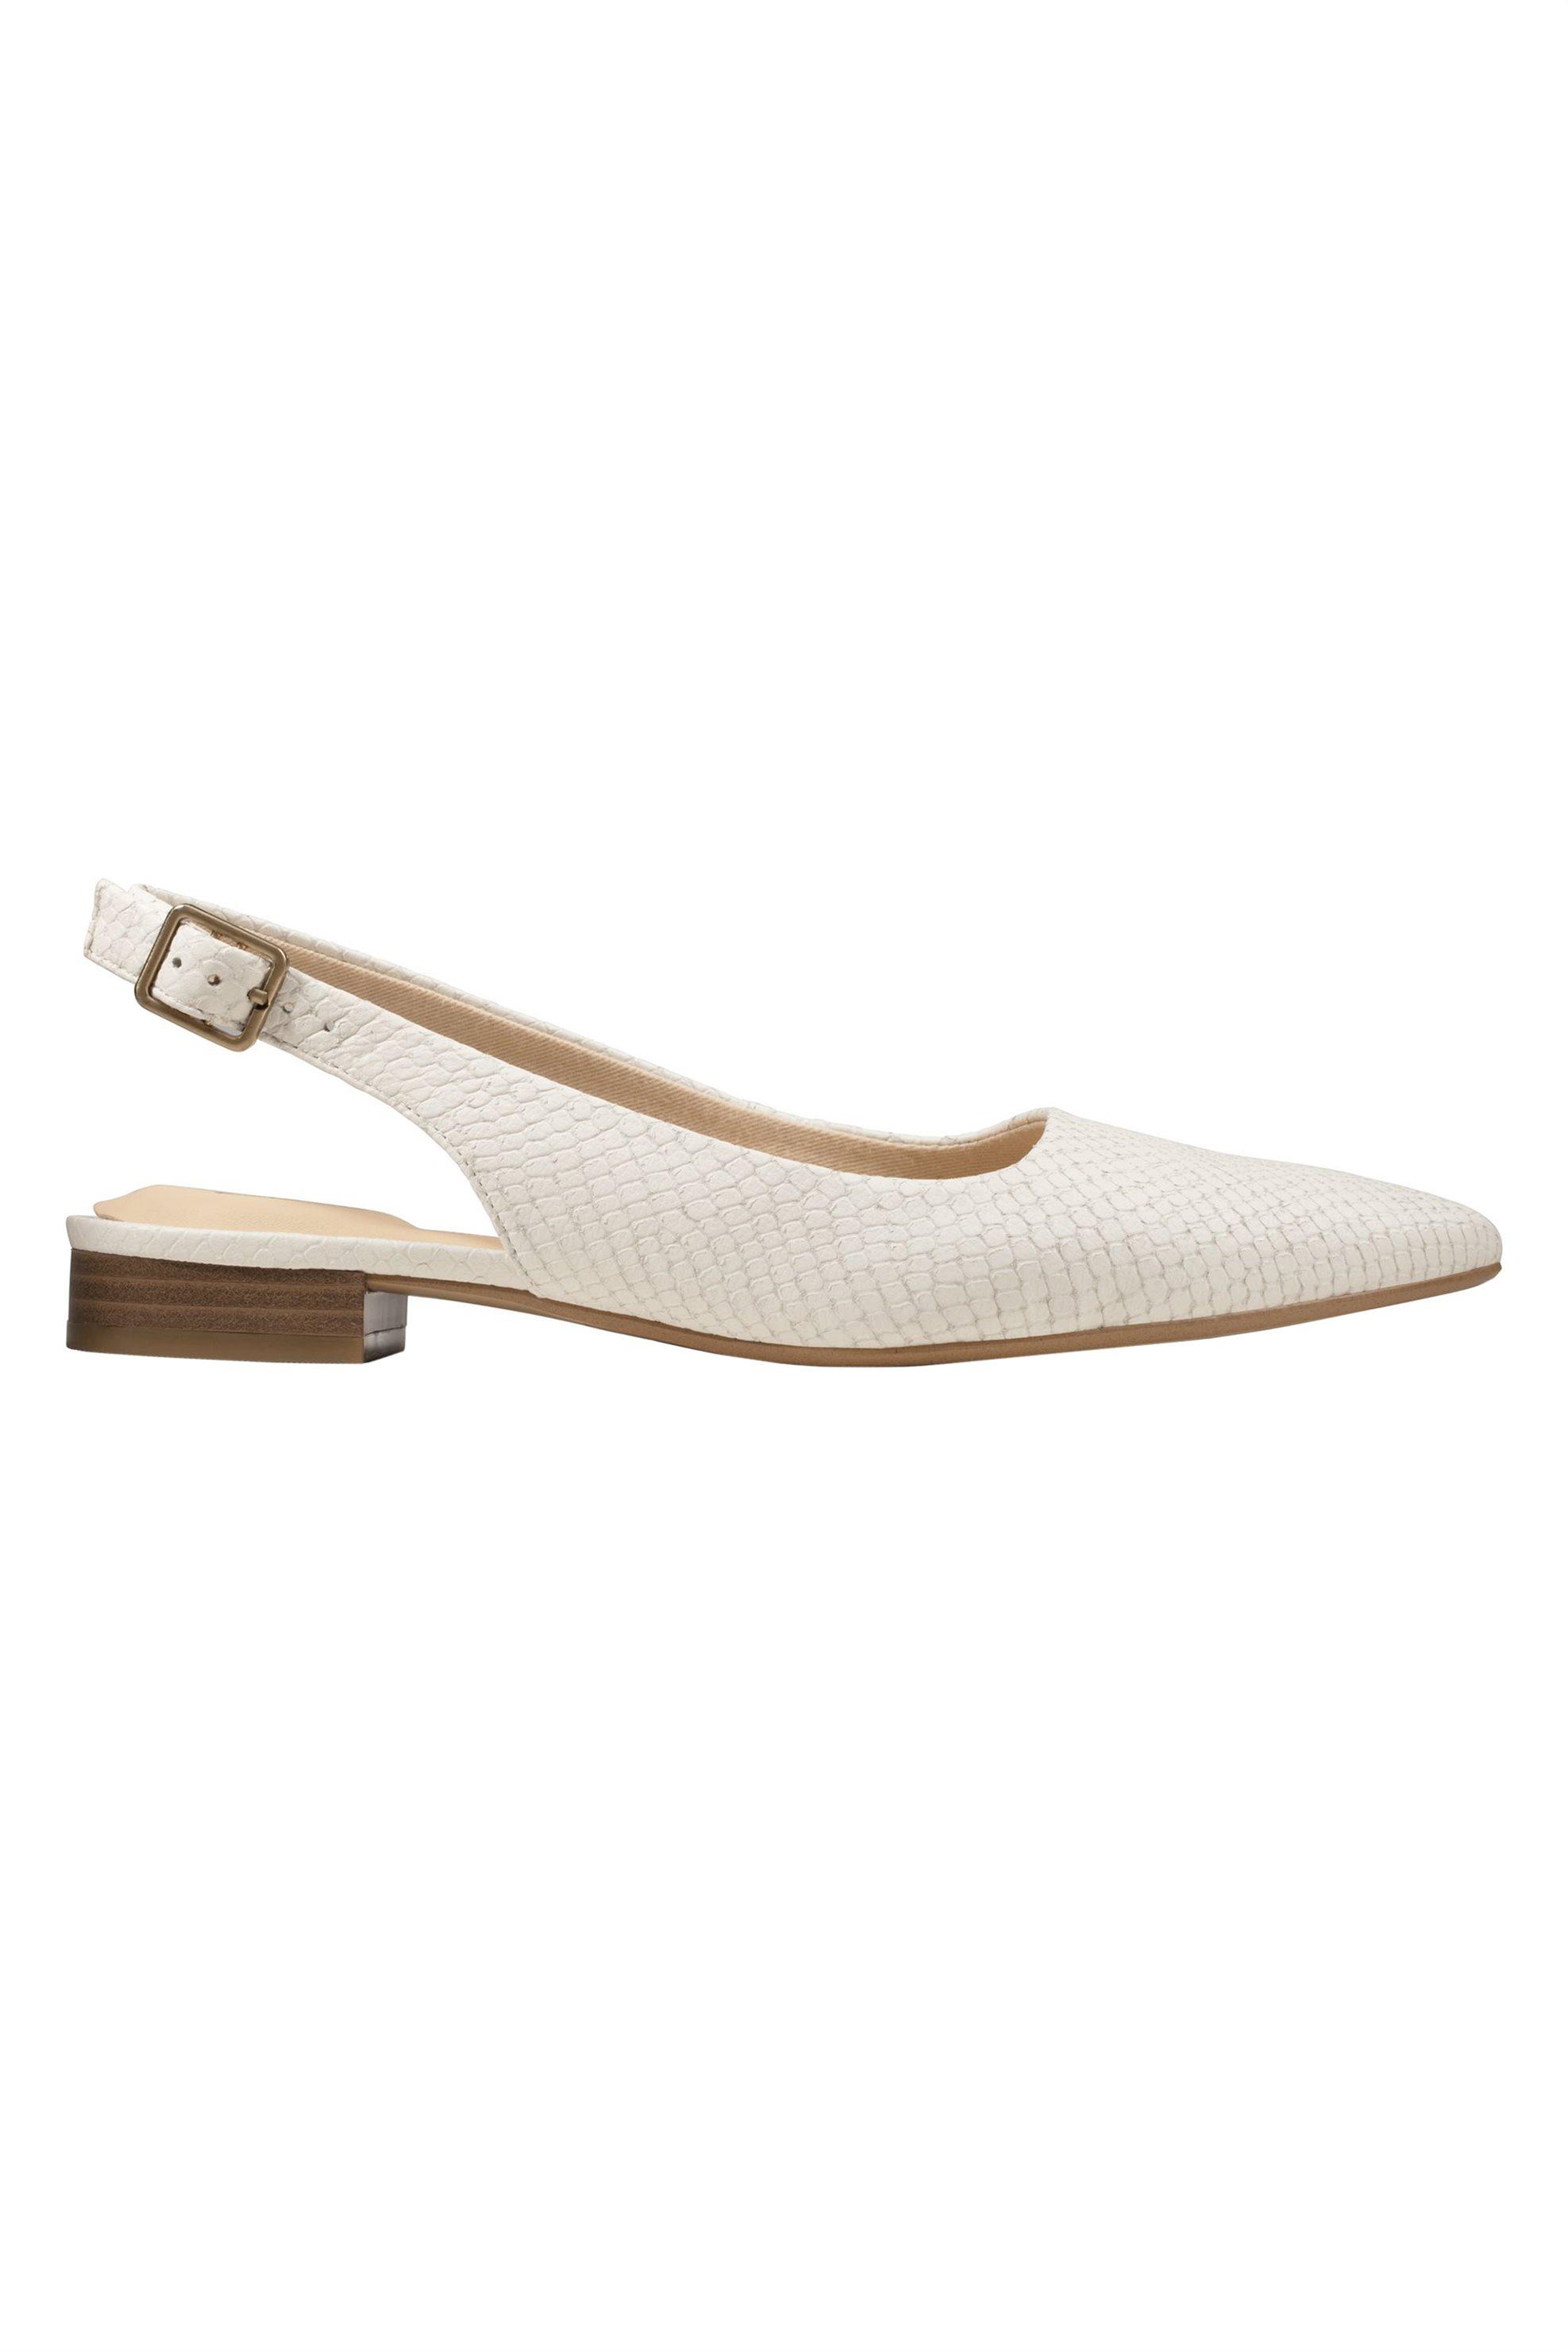 Clarks γυναικεία δερμάτινα παπούτσια slingback με snake print ''Laina 15 Sling'' - 26148861 - Λευκό